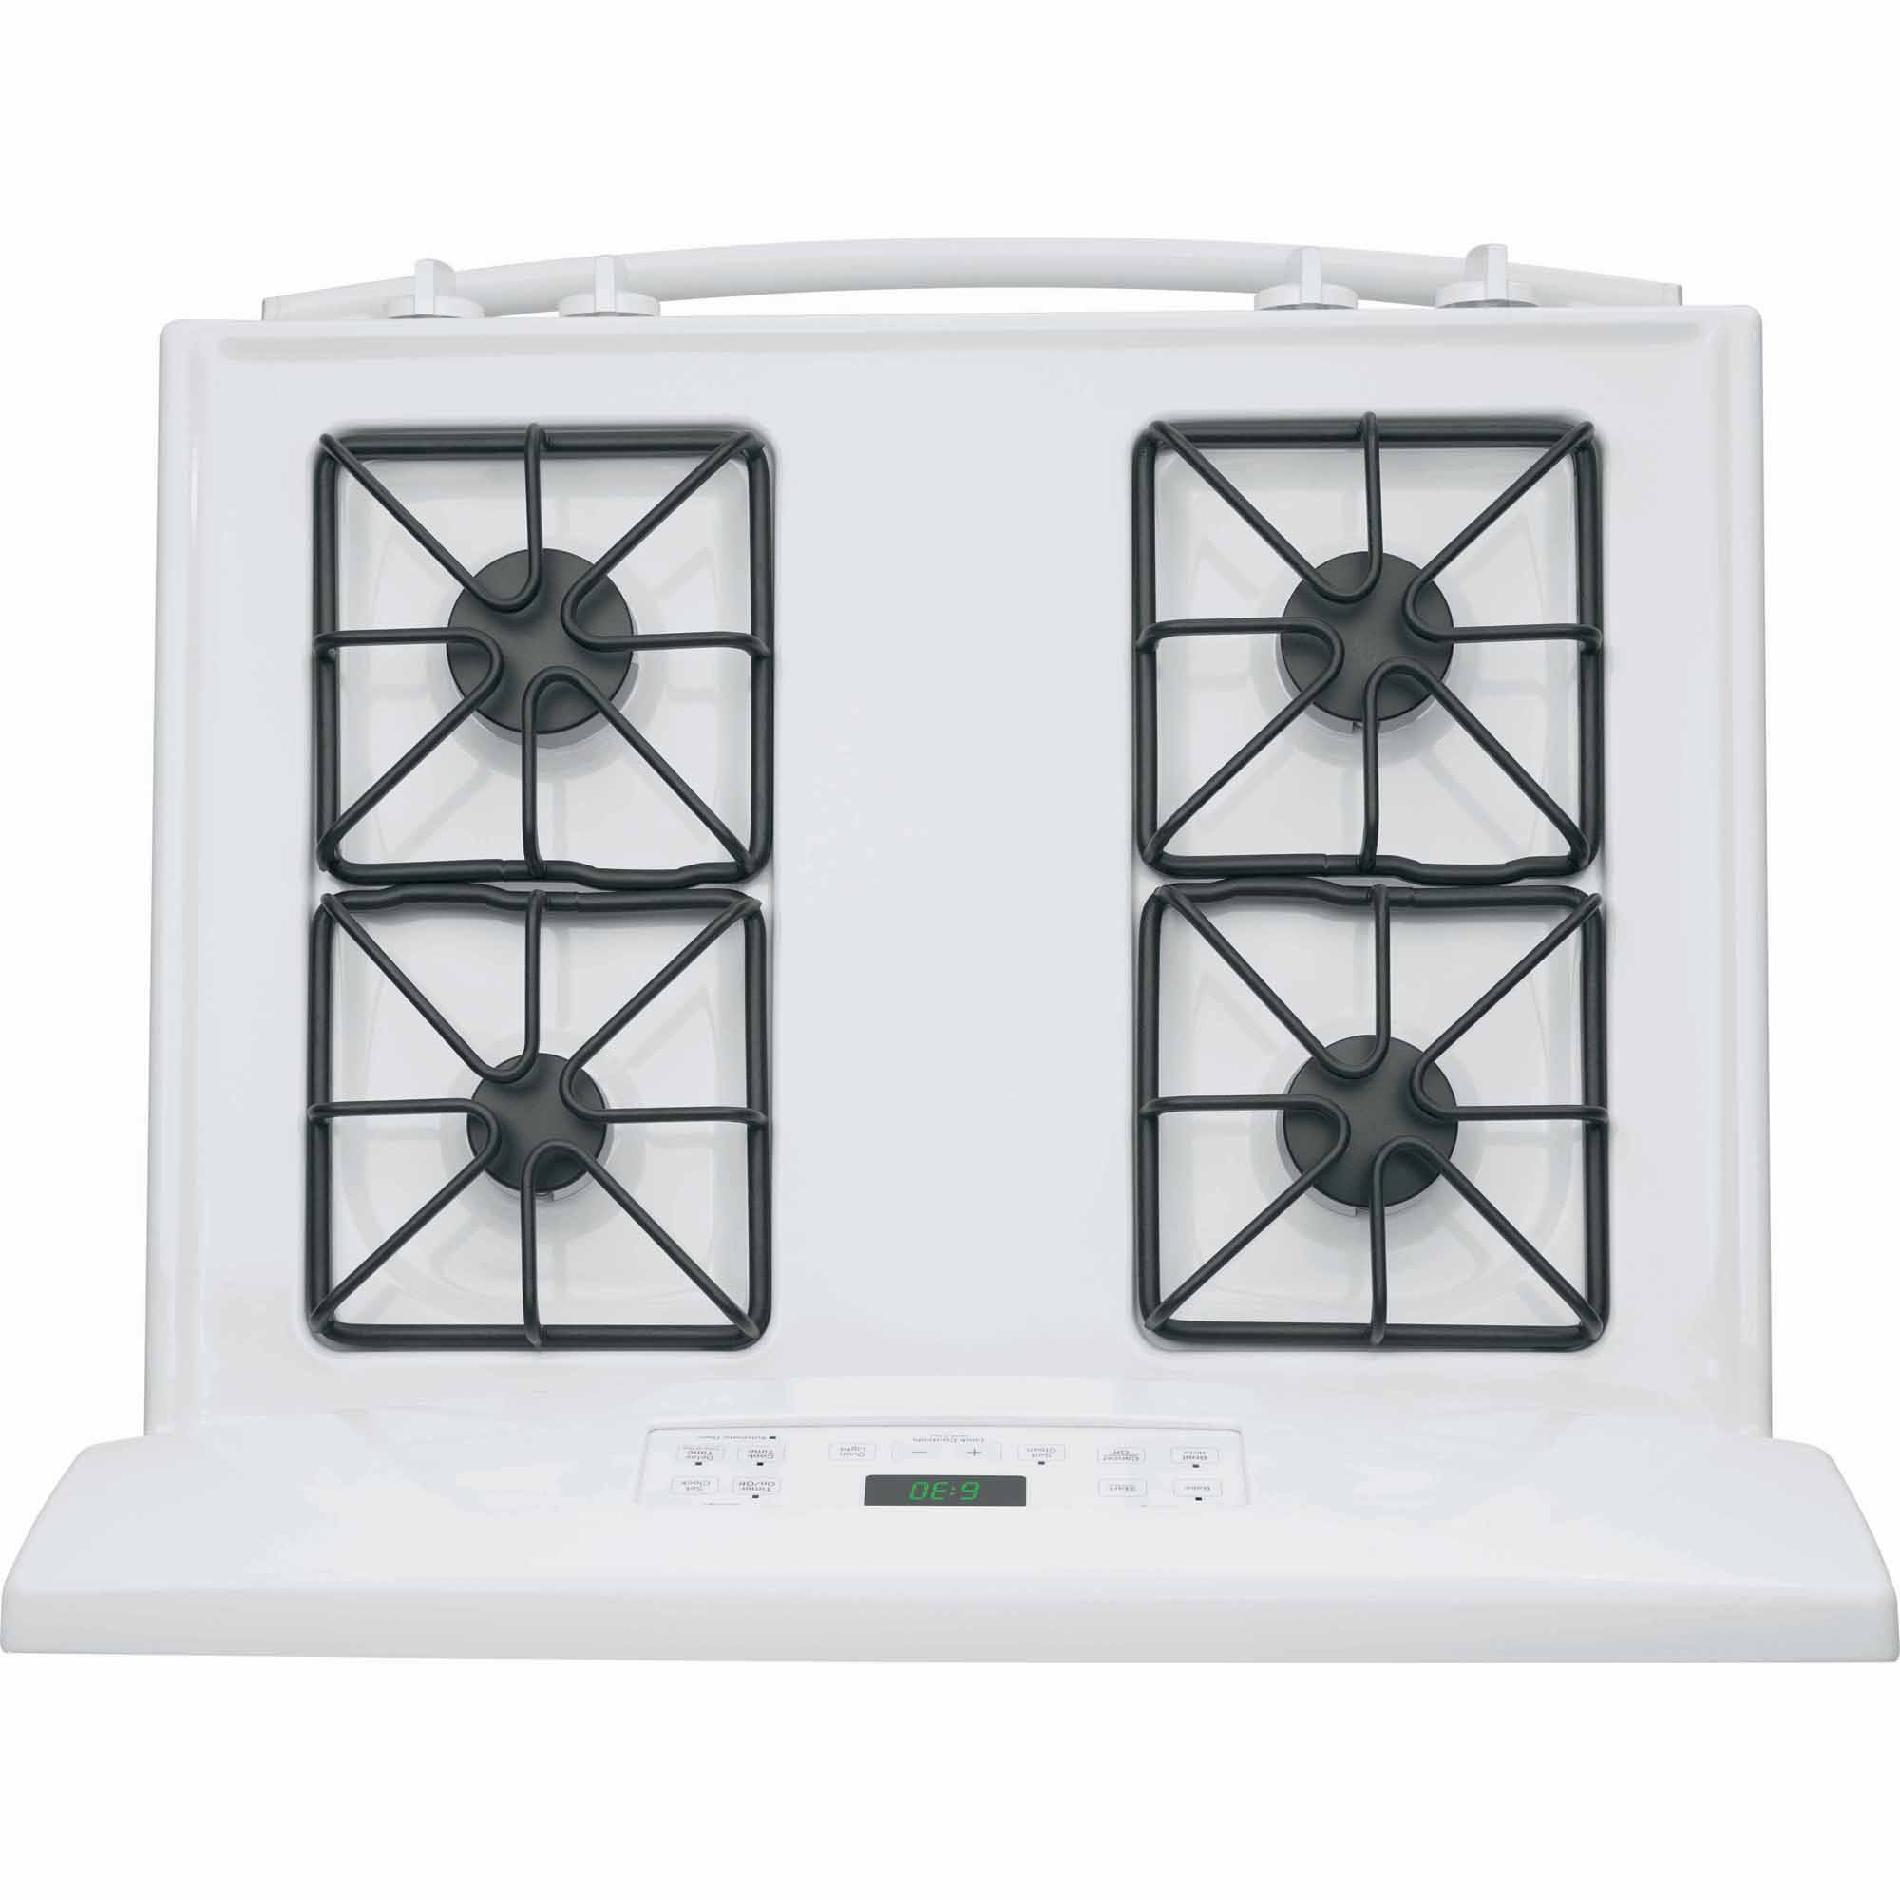 GE Appliances JGB630DEFWW 5.0 cu. ft. Gas Range - White